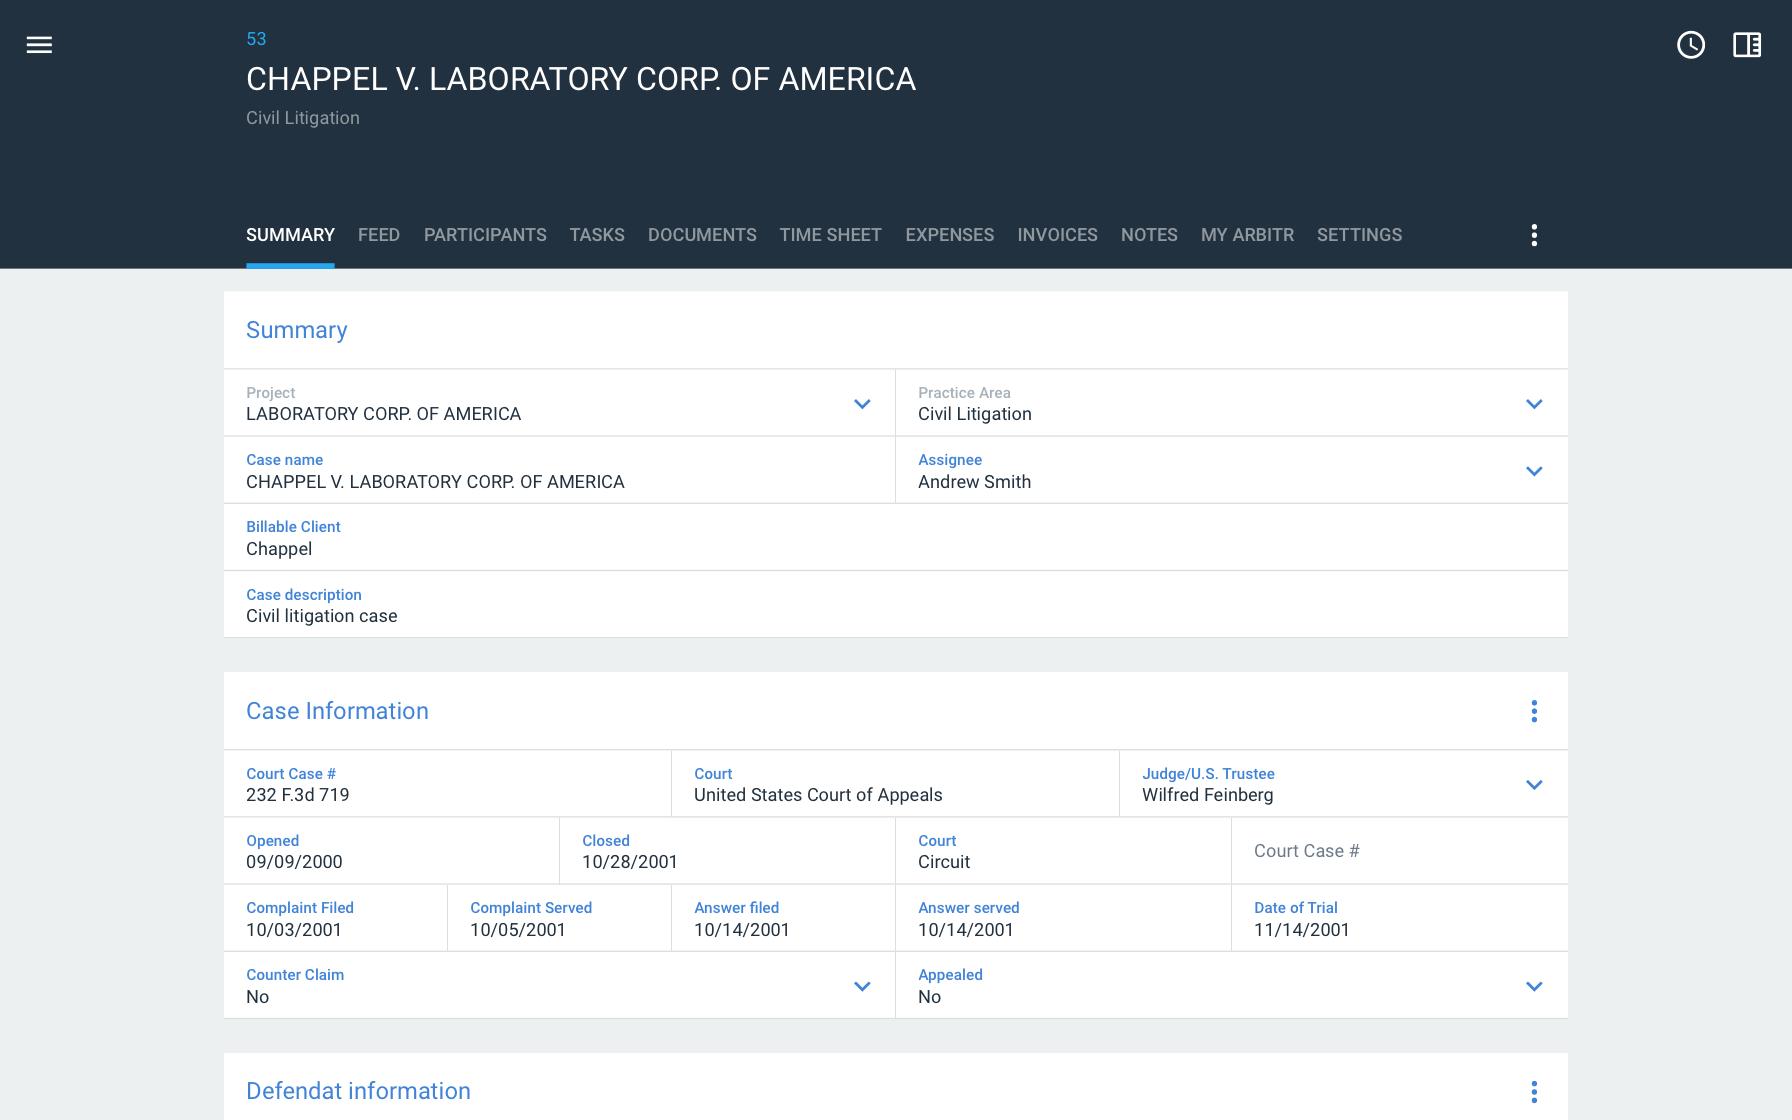 Legal case study database system